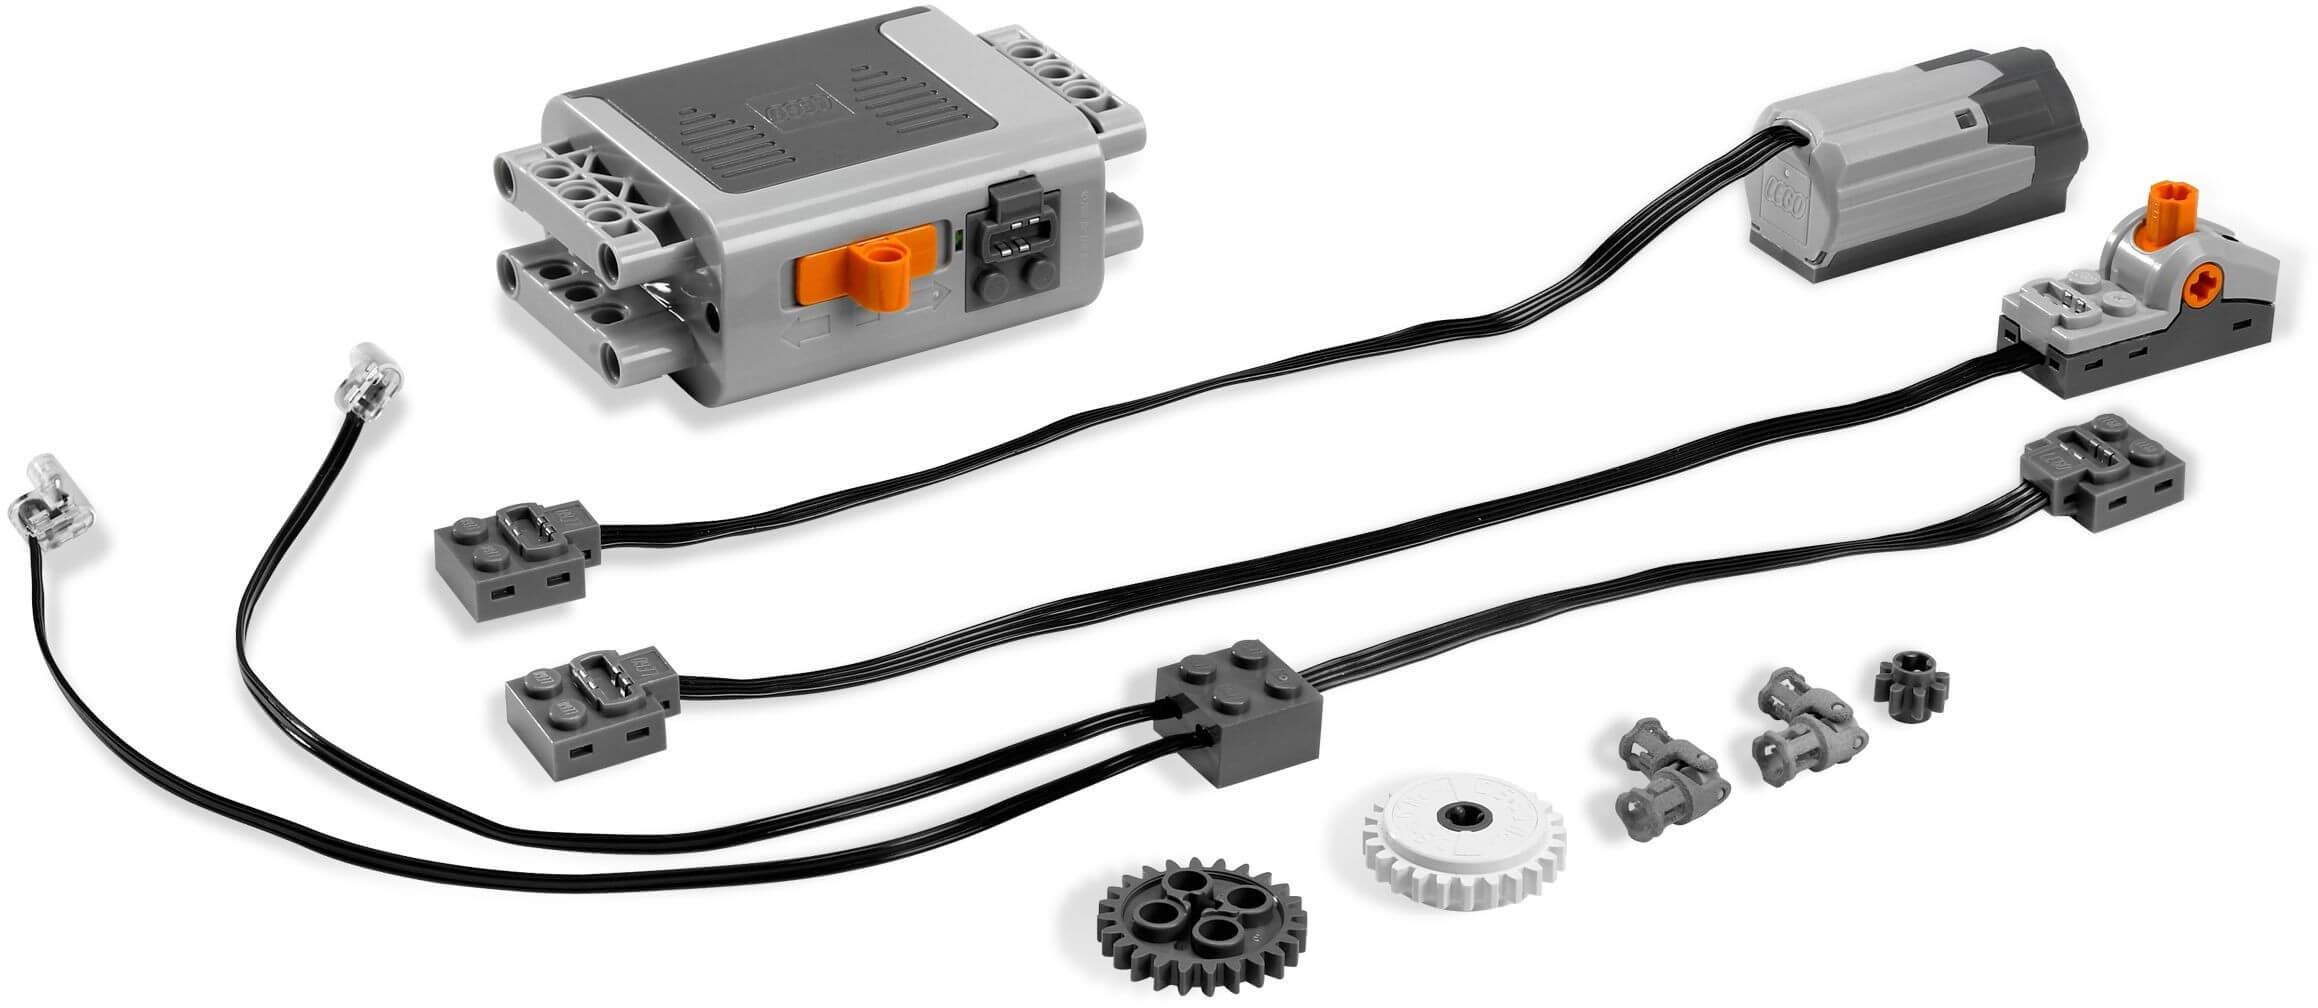 Mua đồ chơi LEGO 8293 - LEGO Power Functions 8293 - Bộ linh kiện LEGO Power Functions cơ bản (LEGO Power Functions Motor Set 8293)